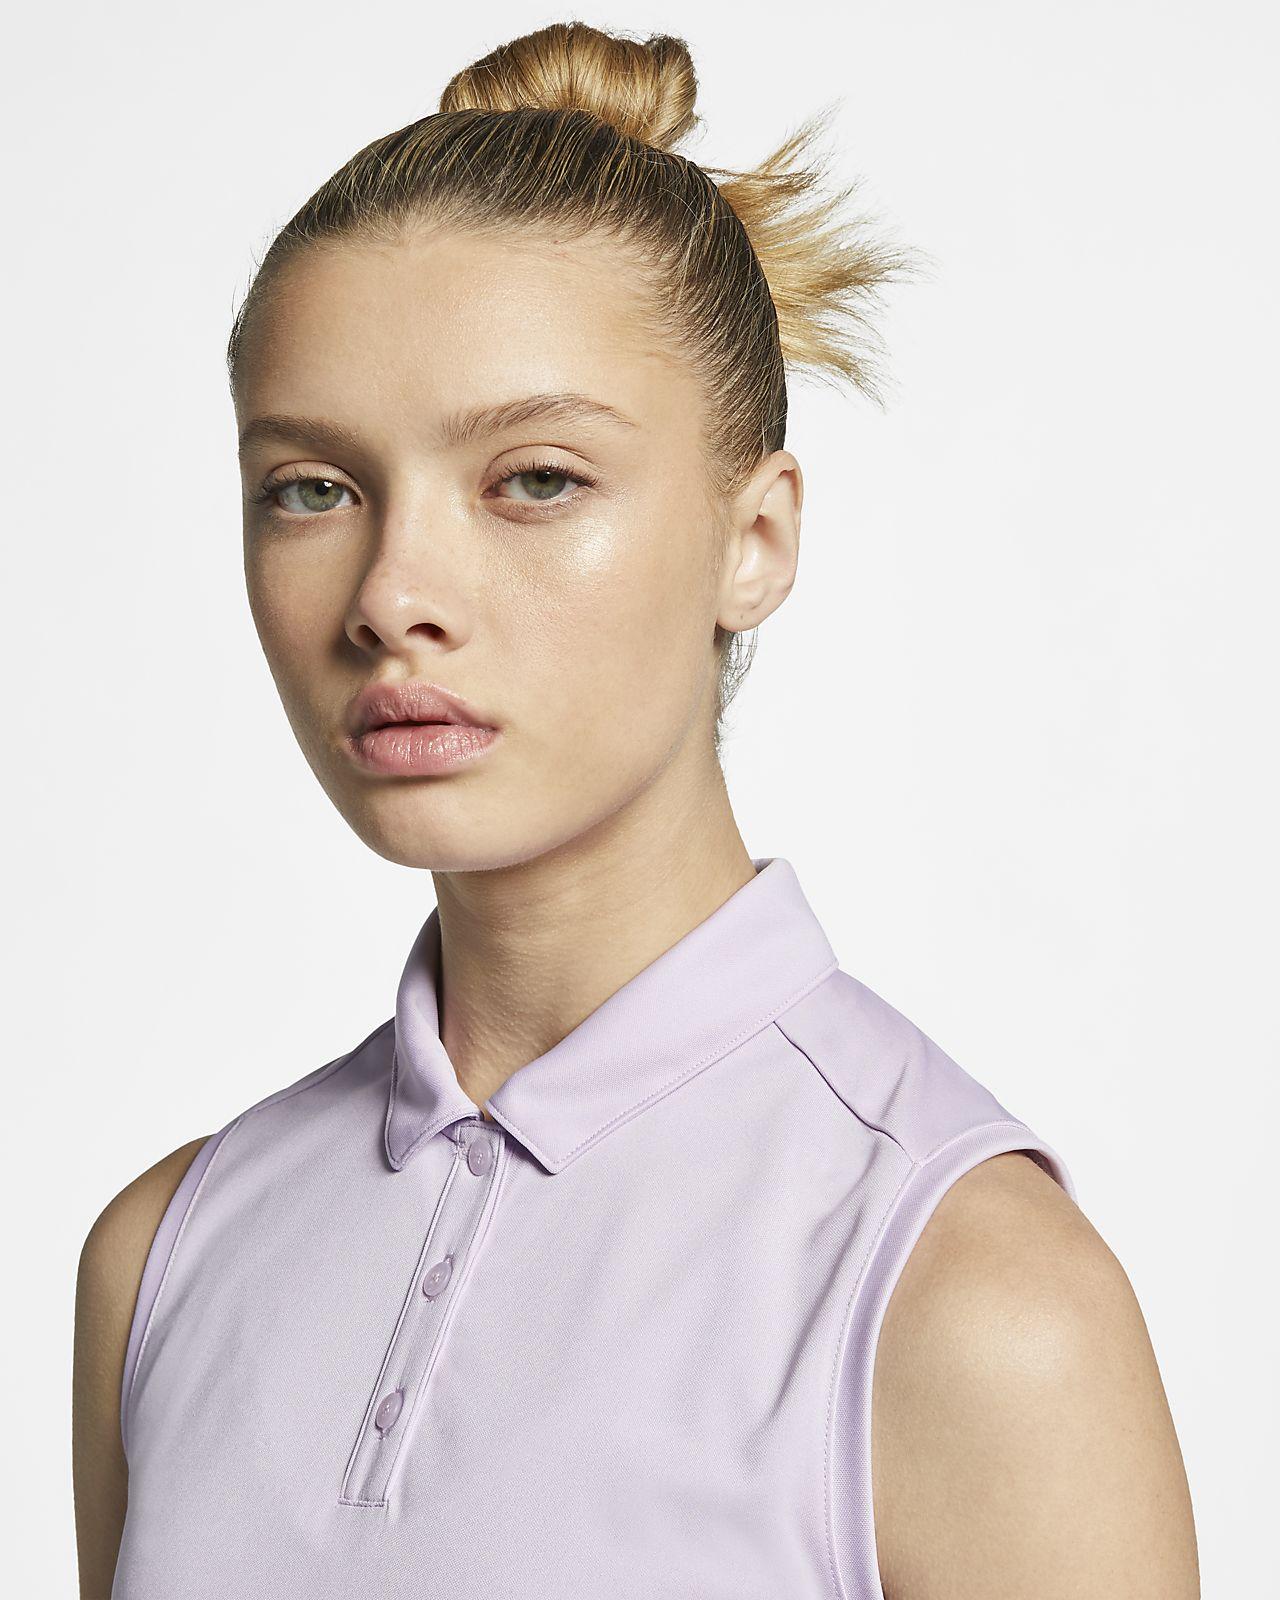 1404b4b6a226 Γυναικεία μπλούζα πόλο για γκολφ Nike Dri-FIT. Nike.com GR